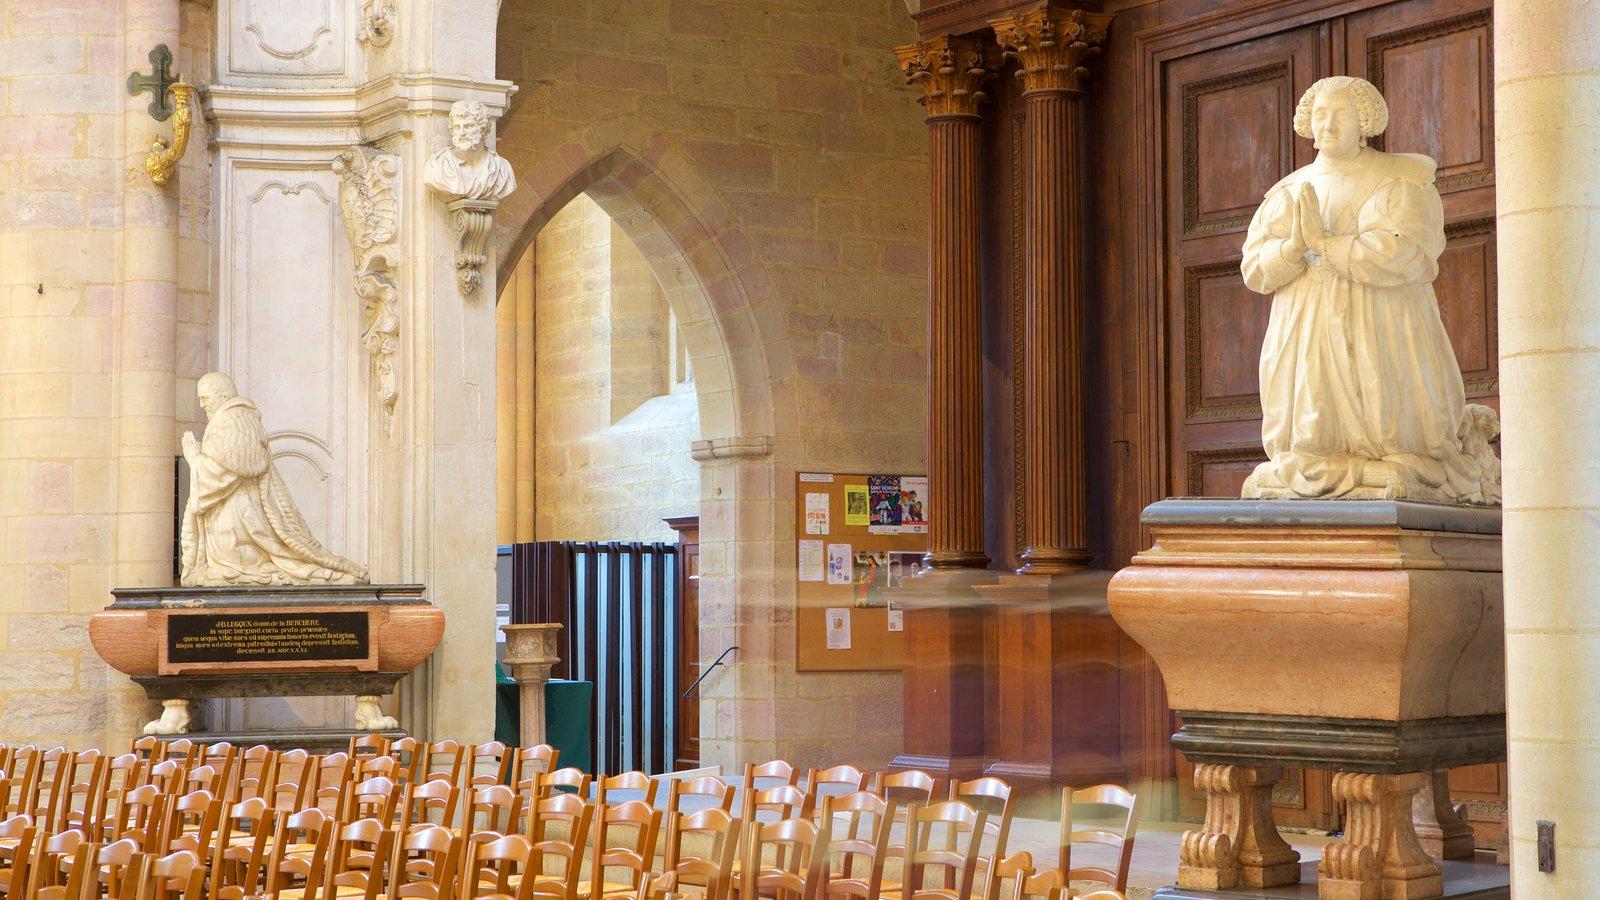 Catedral de Dijon caracterizando vistas internas e uma igreja ou catedral